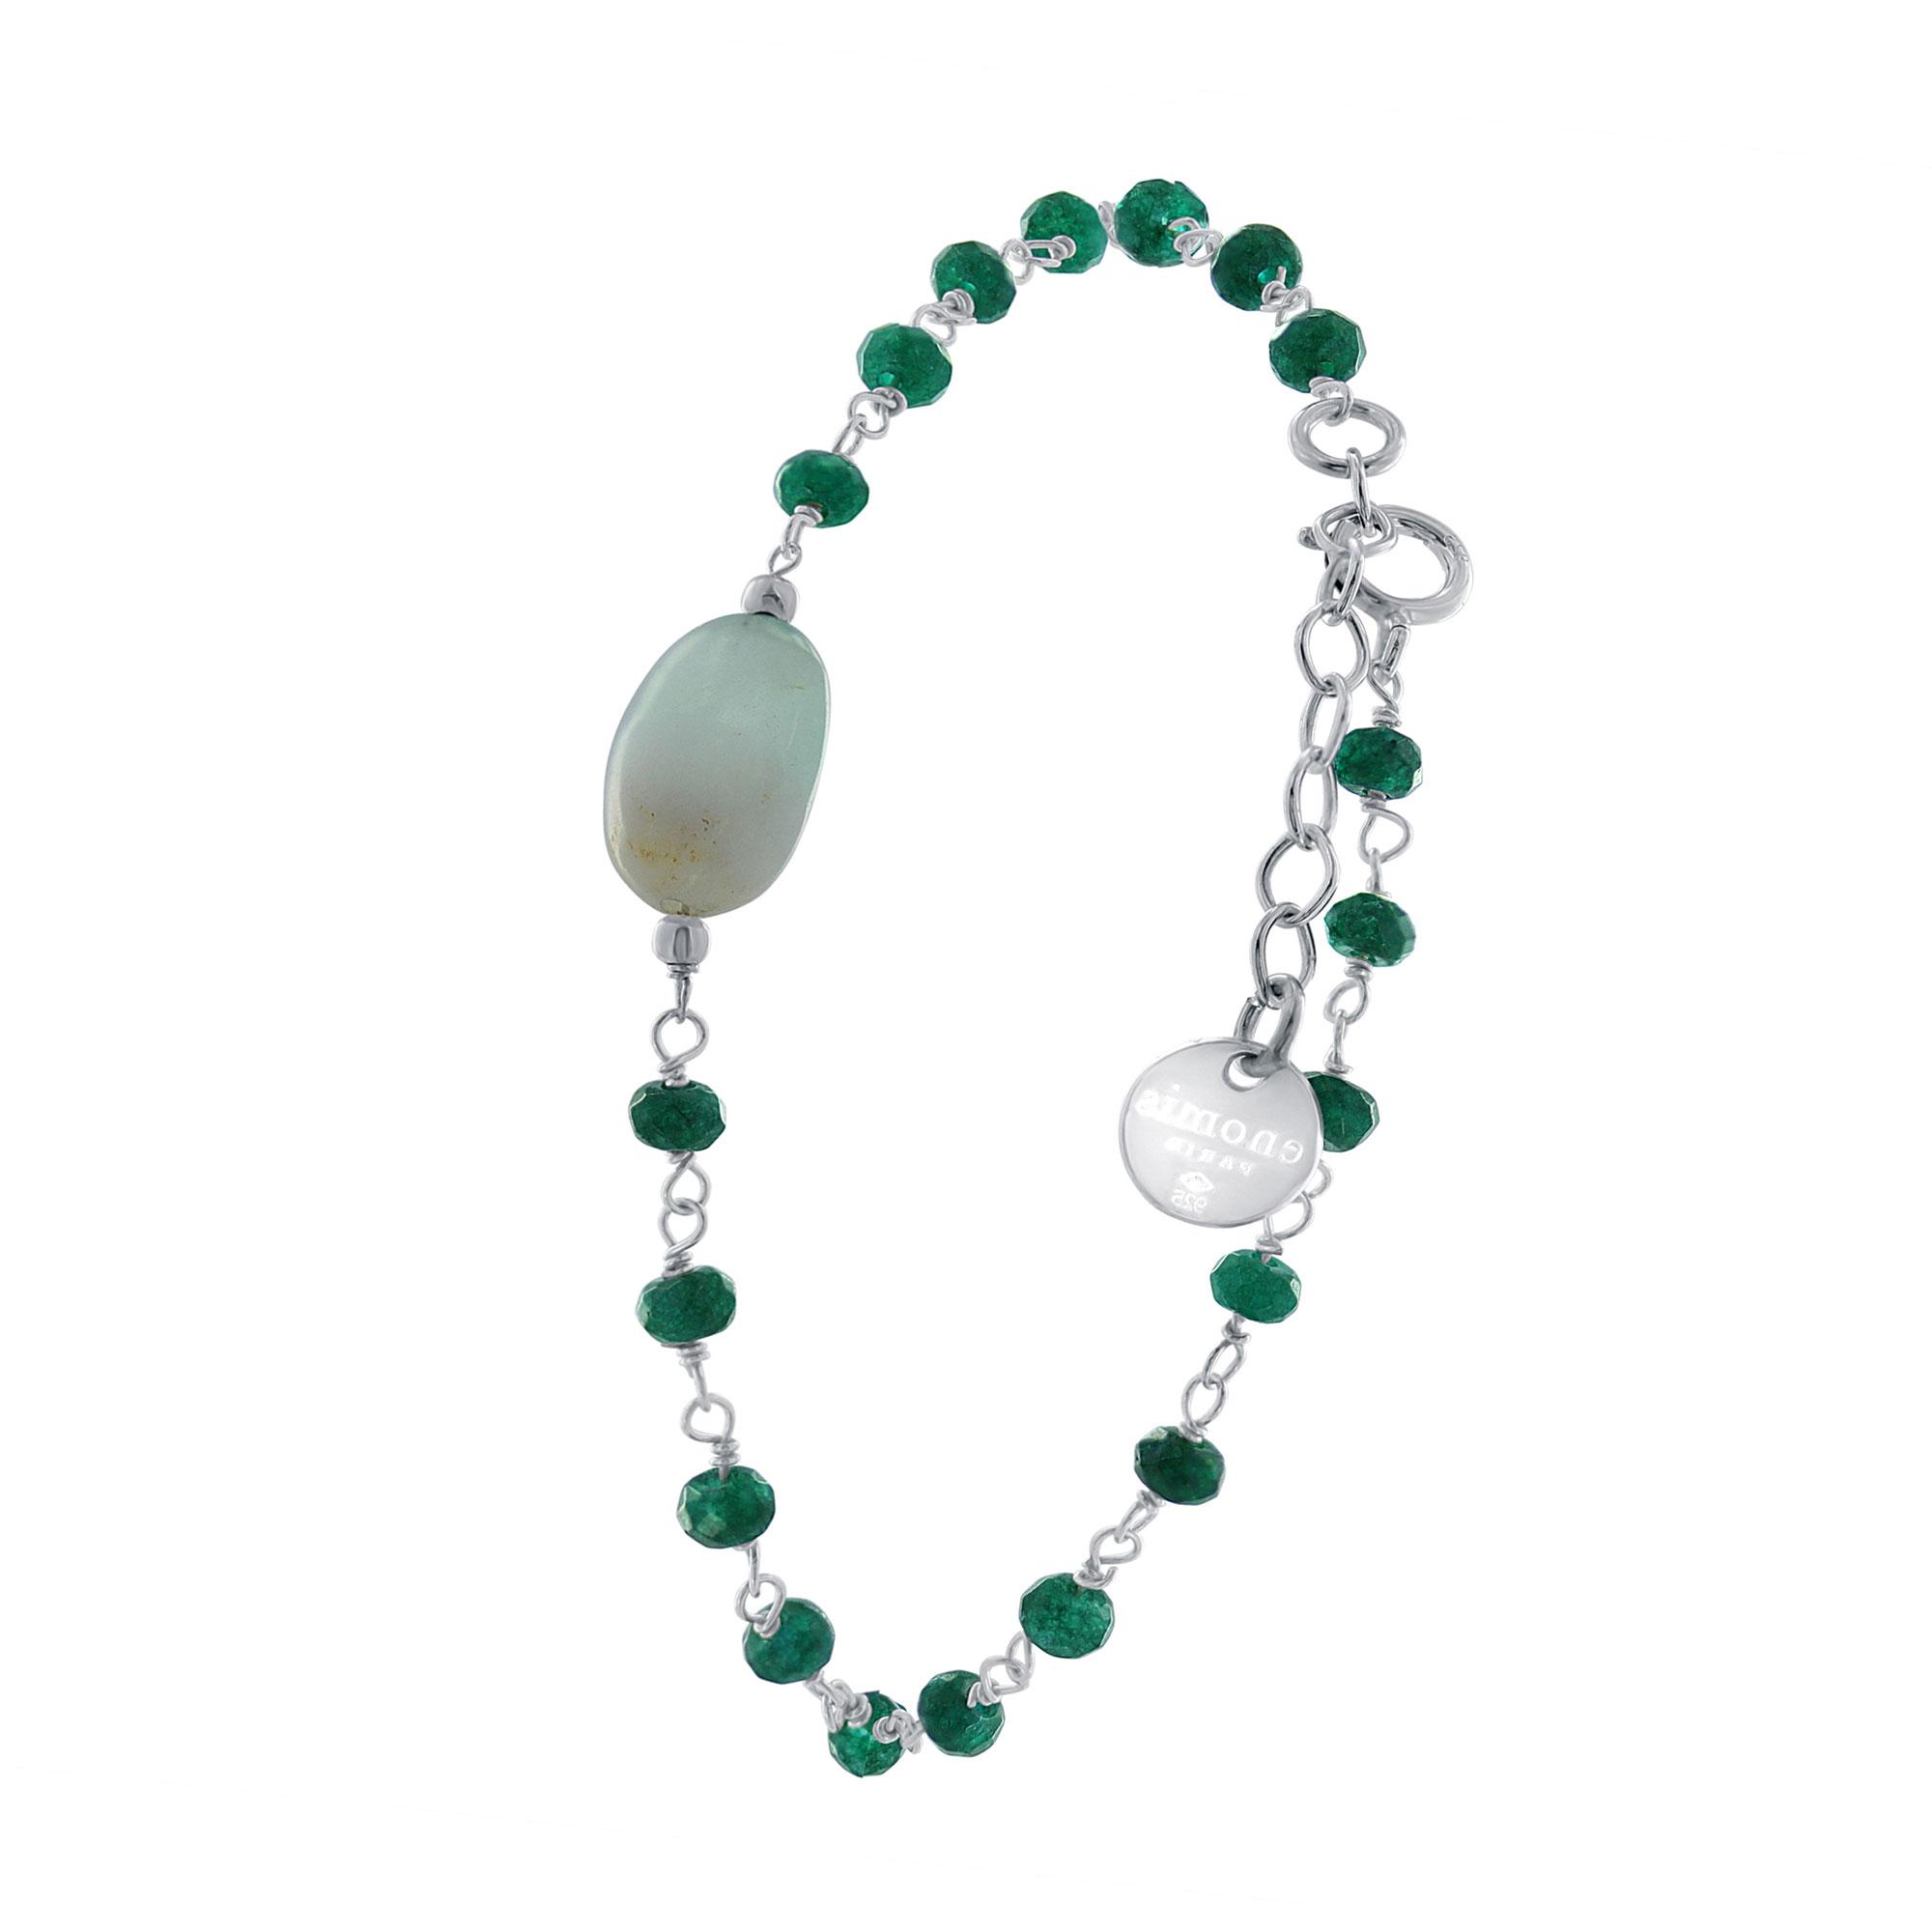 AGATE VERTE and ARGENT Green agate and Sterling silver bracelet. 925 Bracelet